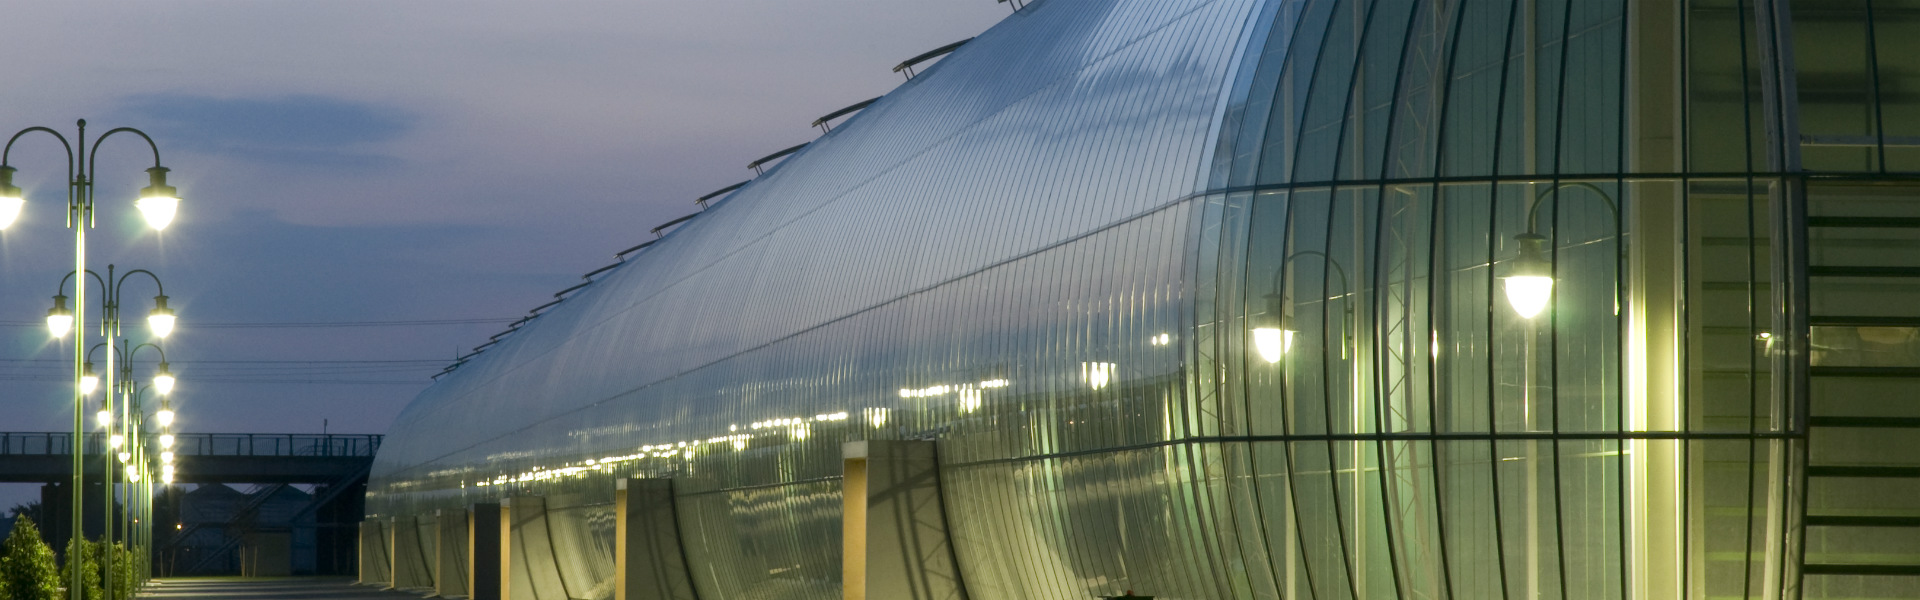 Custom gable system | Alcomij